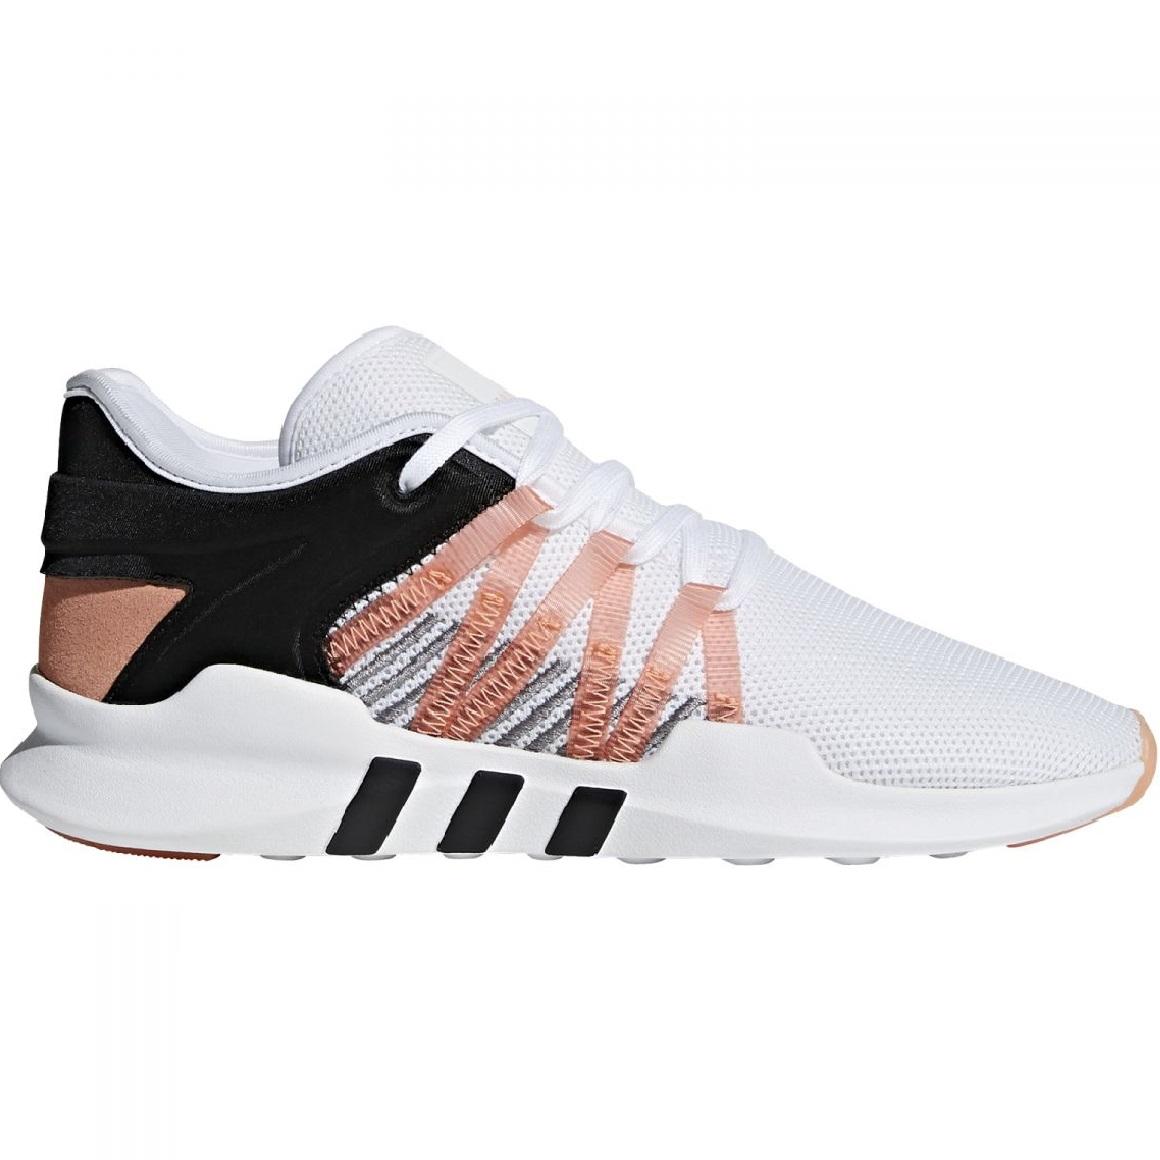 timeless design 60a34 16c40 adidas Originals EQT Racing ADV Sneaker. Damen Schuhe weiß coral